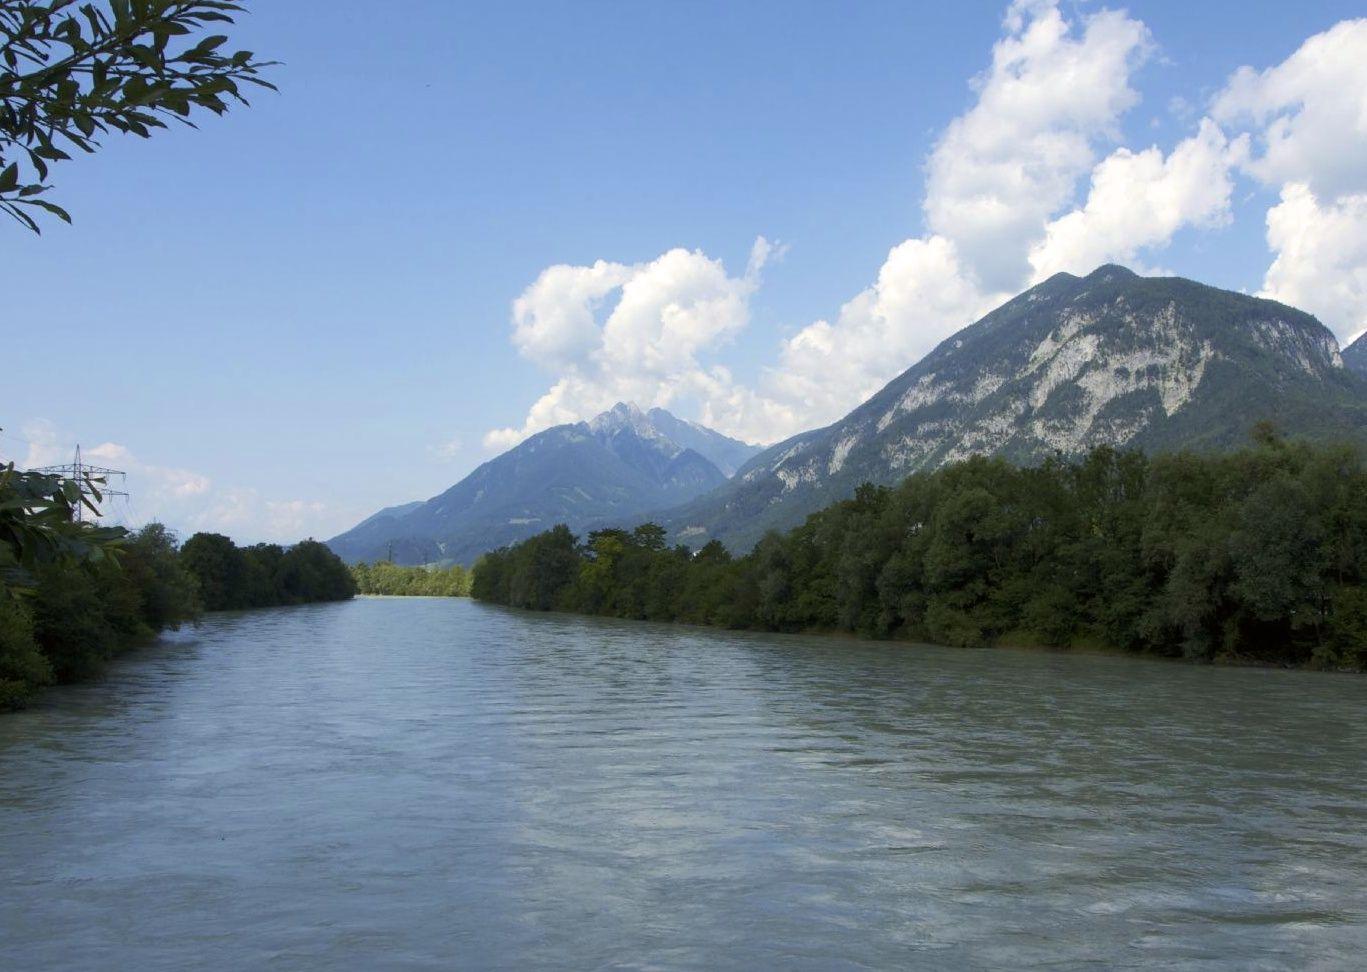 _Holiday.548.8767_full.jpg - Austria - Tyrolean Valleys - Self-Guided Leisure Cycling Holiday - Leisure Cycling